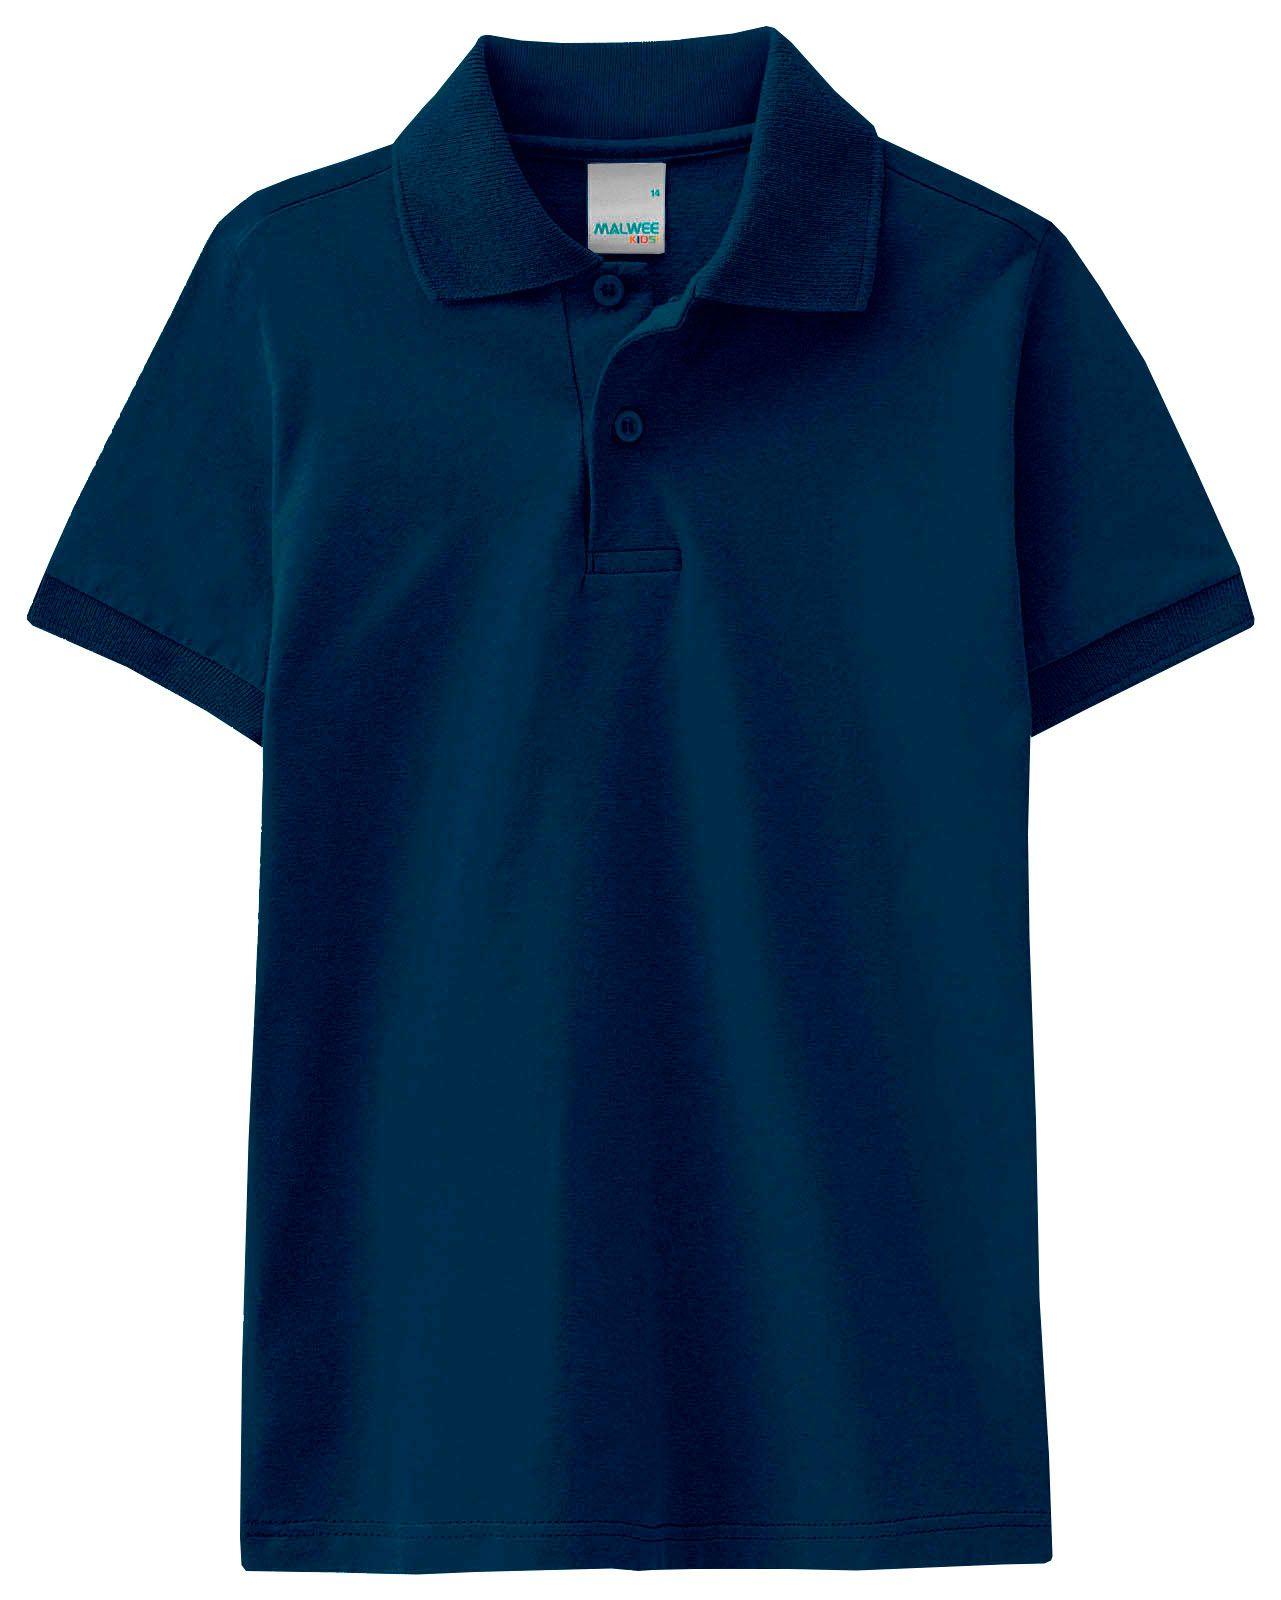 Polo Infantil Masculina Verão Azul Malwee